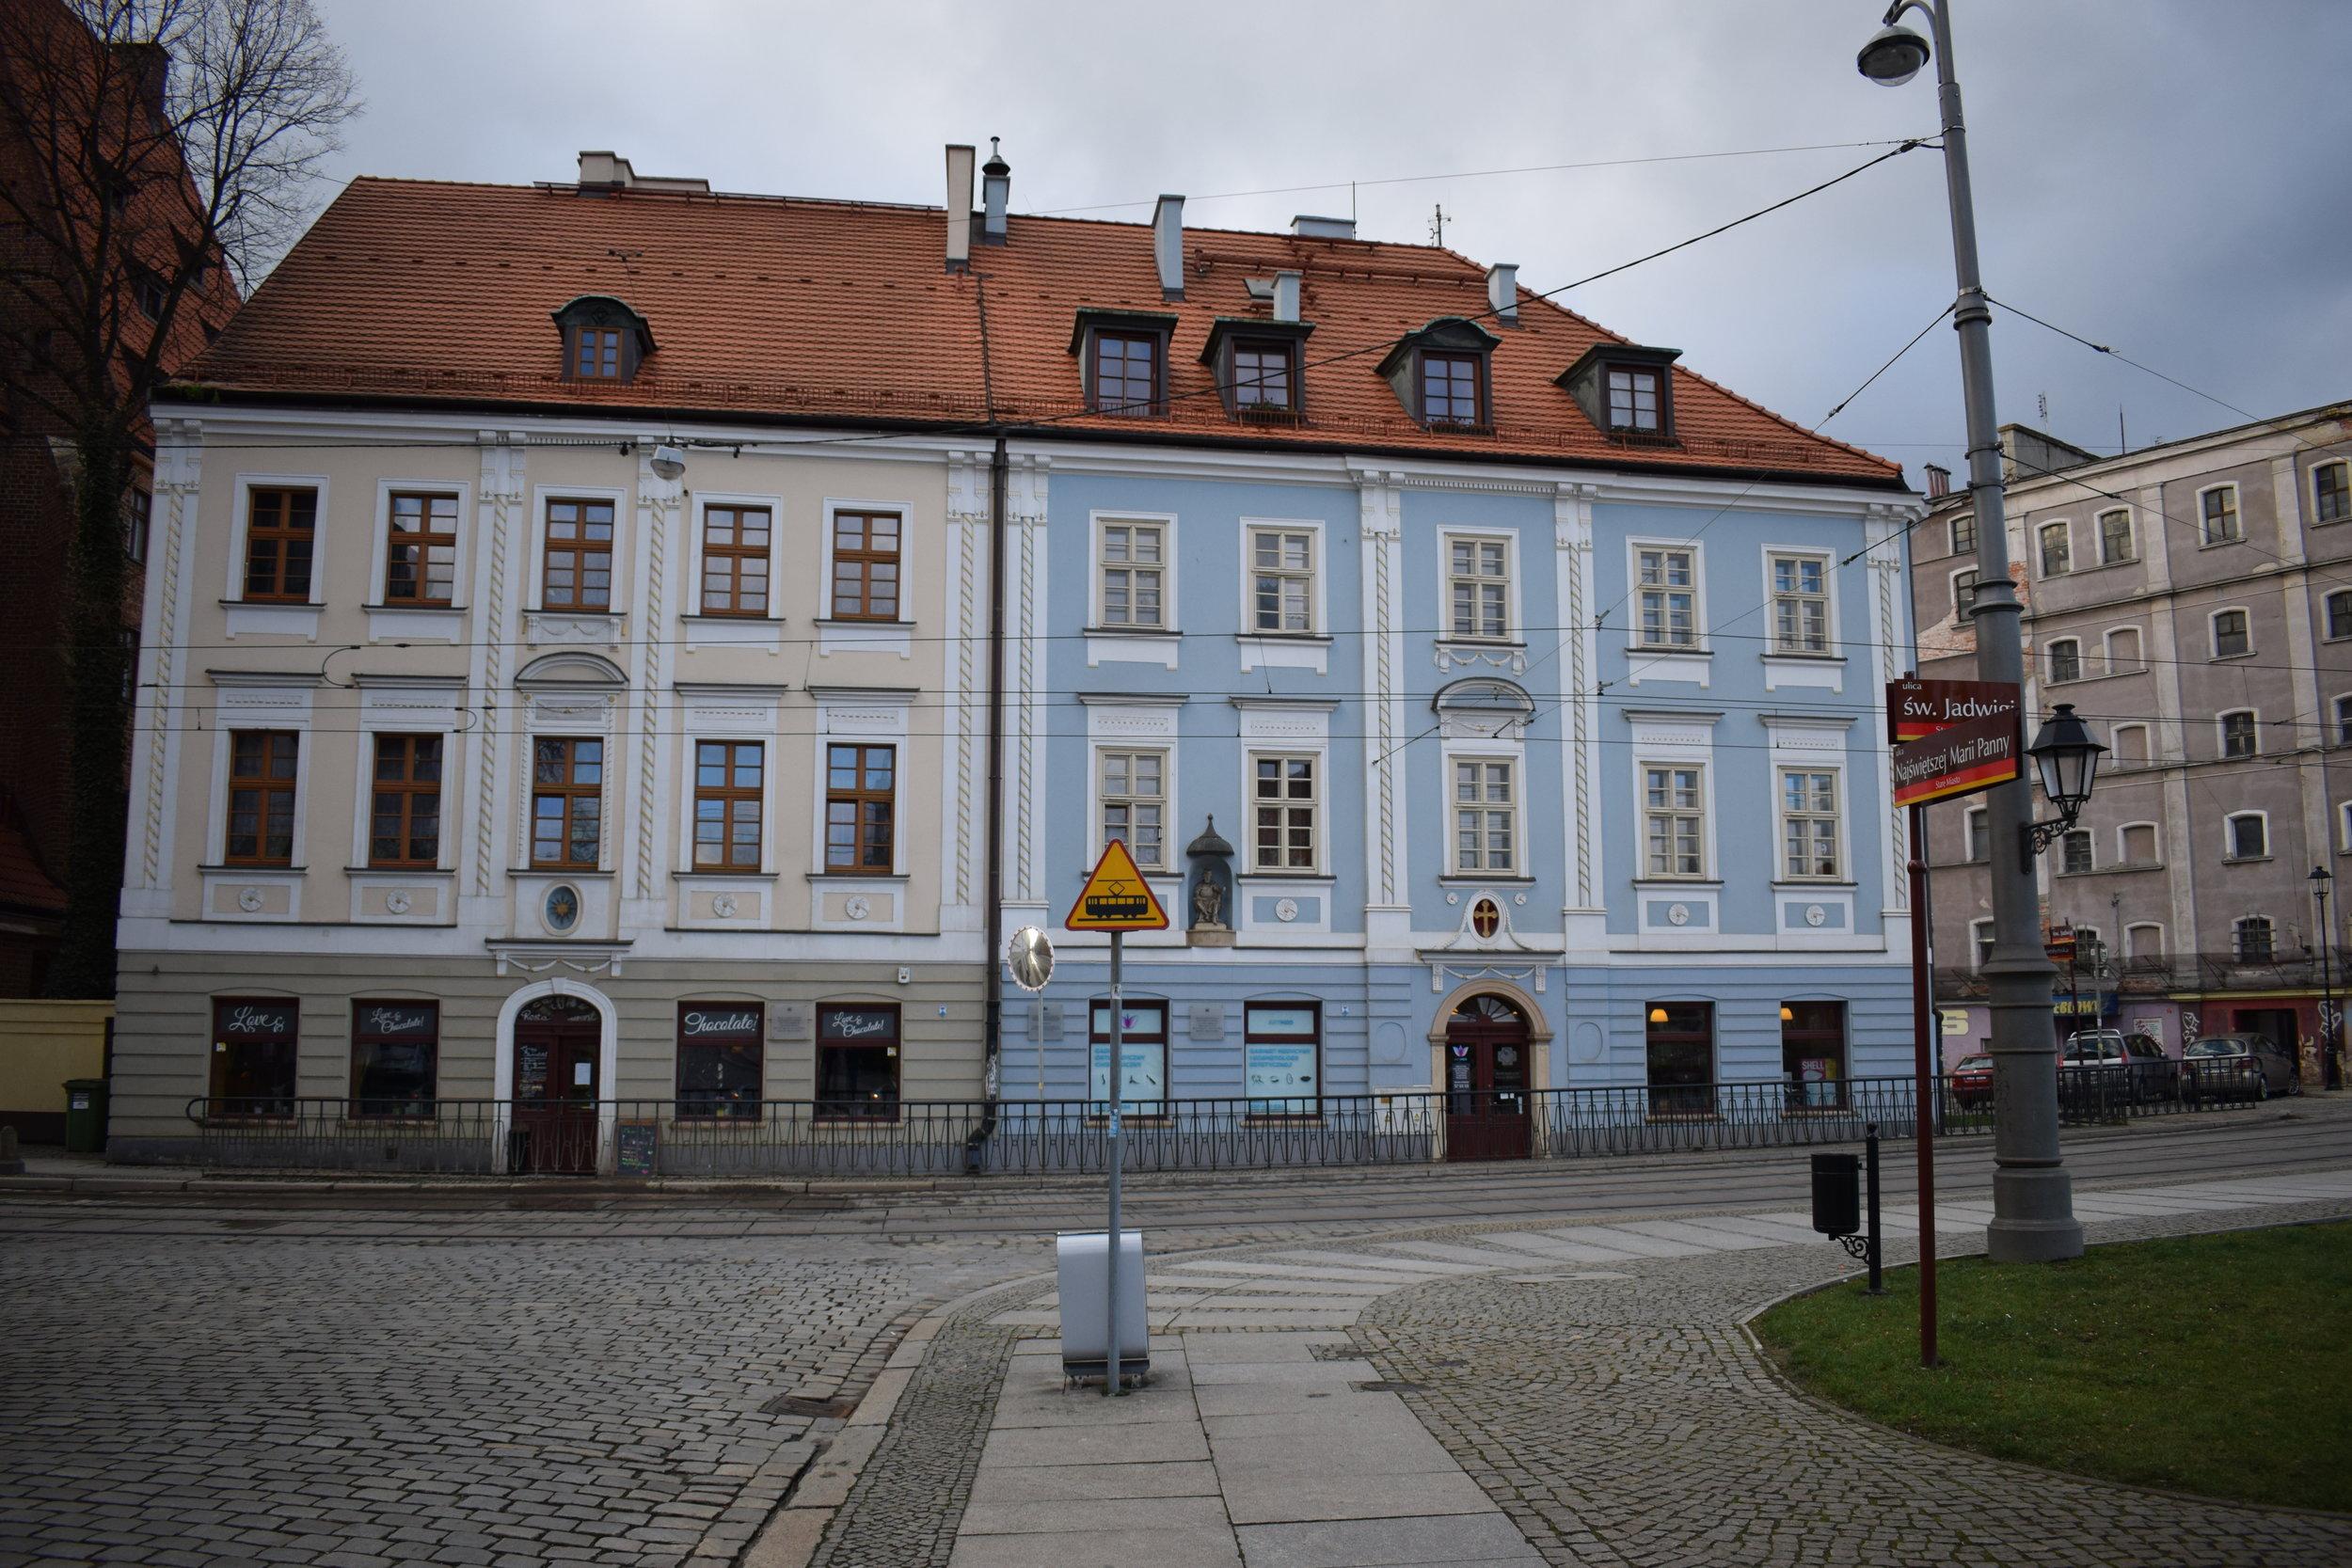 Wroclaw-Street-Buildings